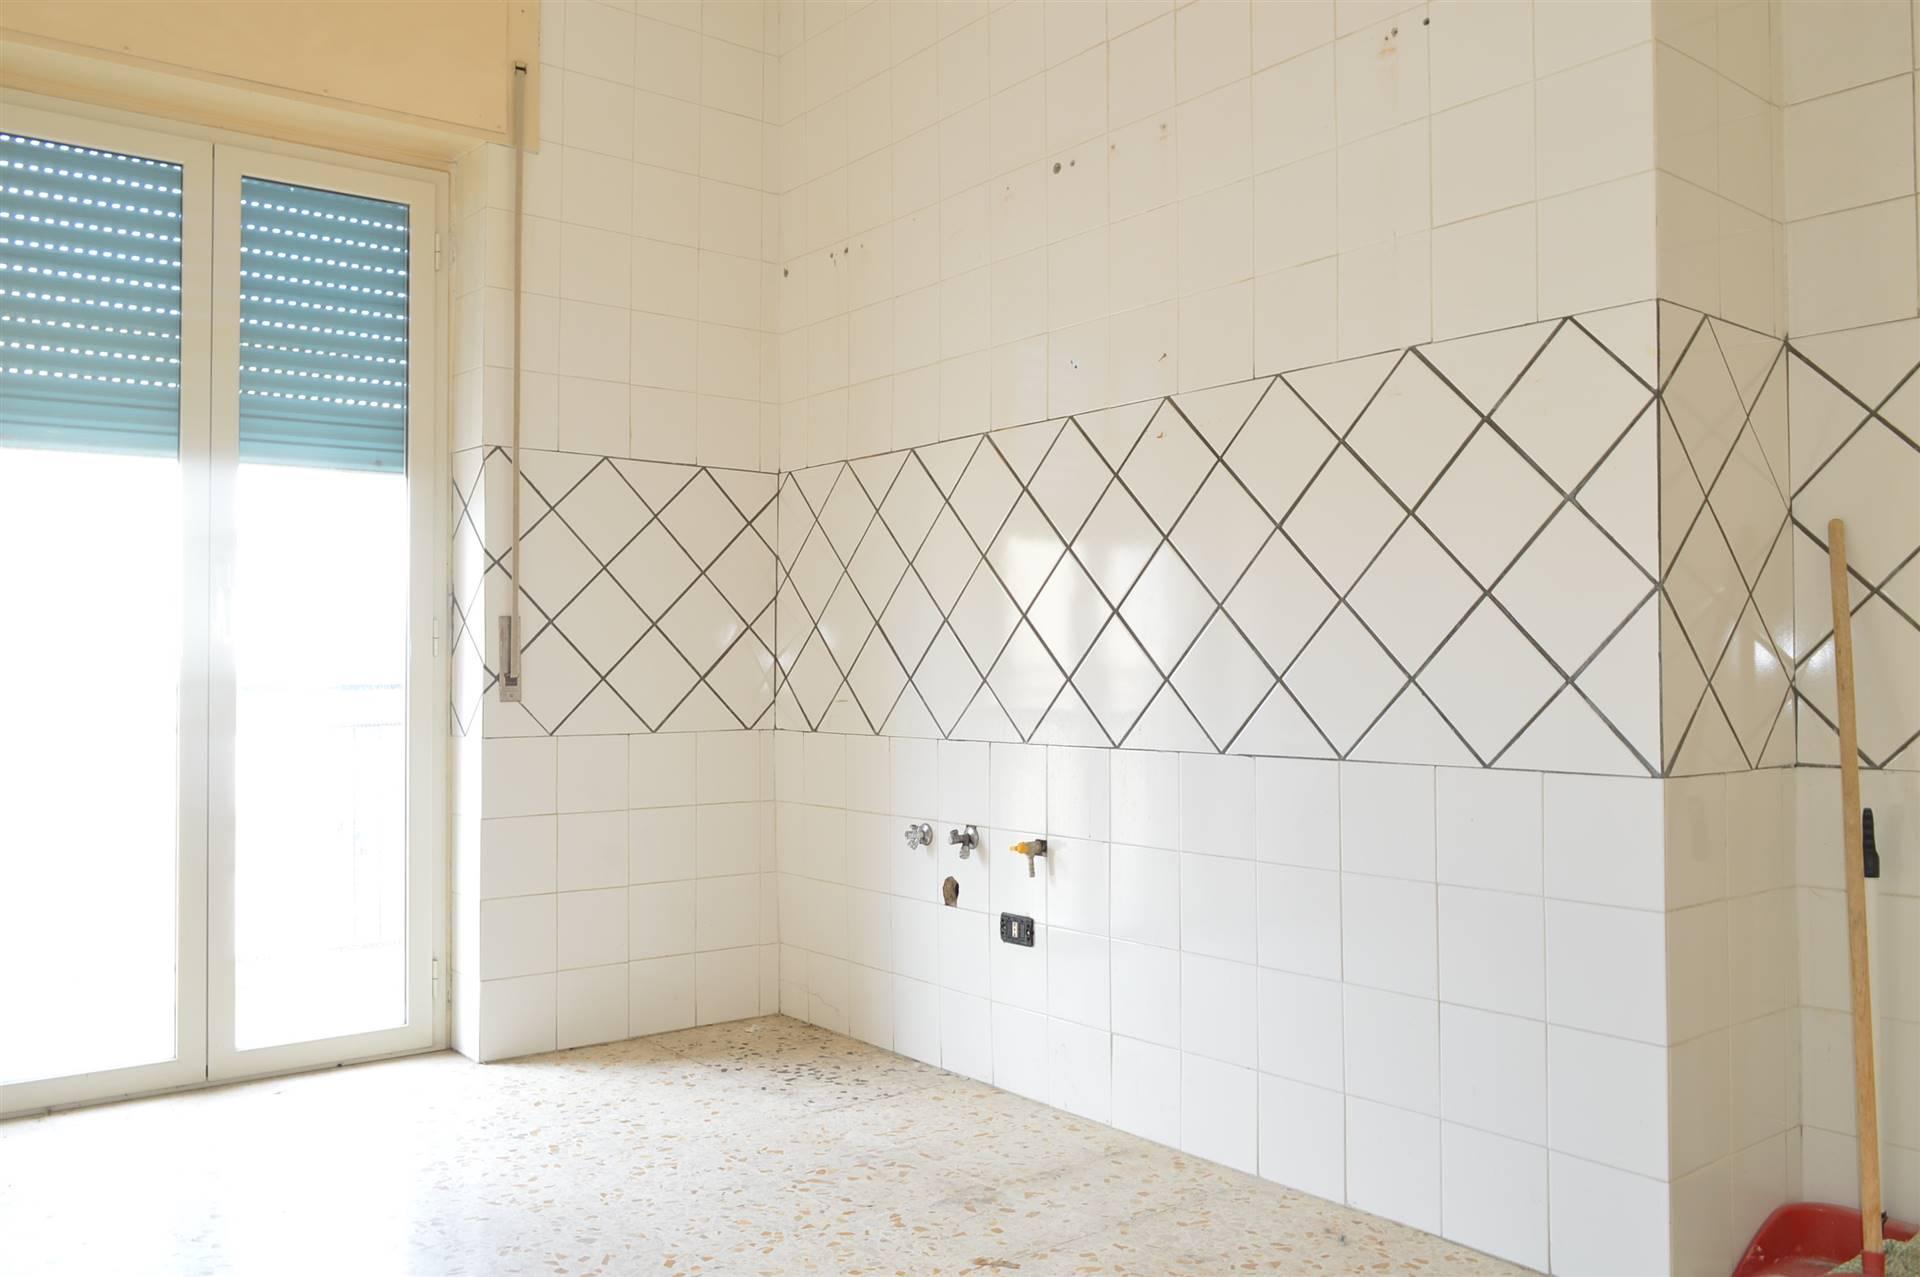 AF863A-Appartamento-SANTA-MARIA-CAPUA-VETERE-Via-Salvemini